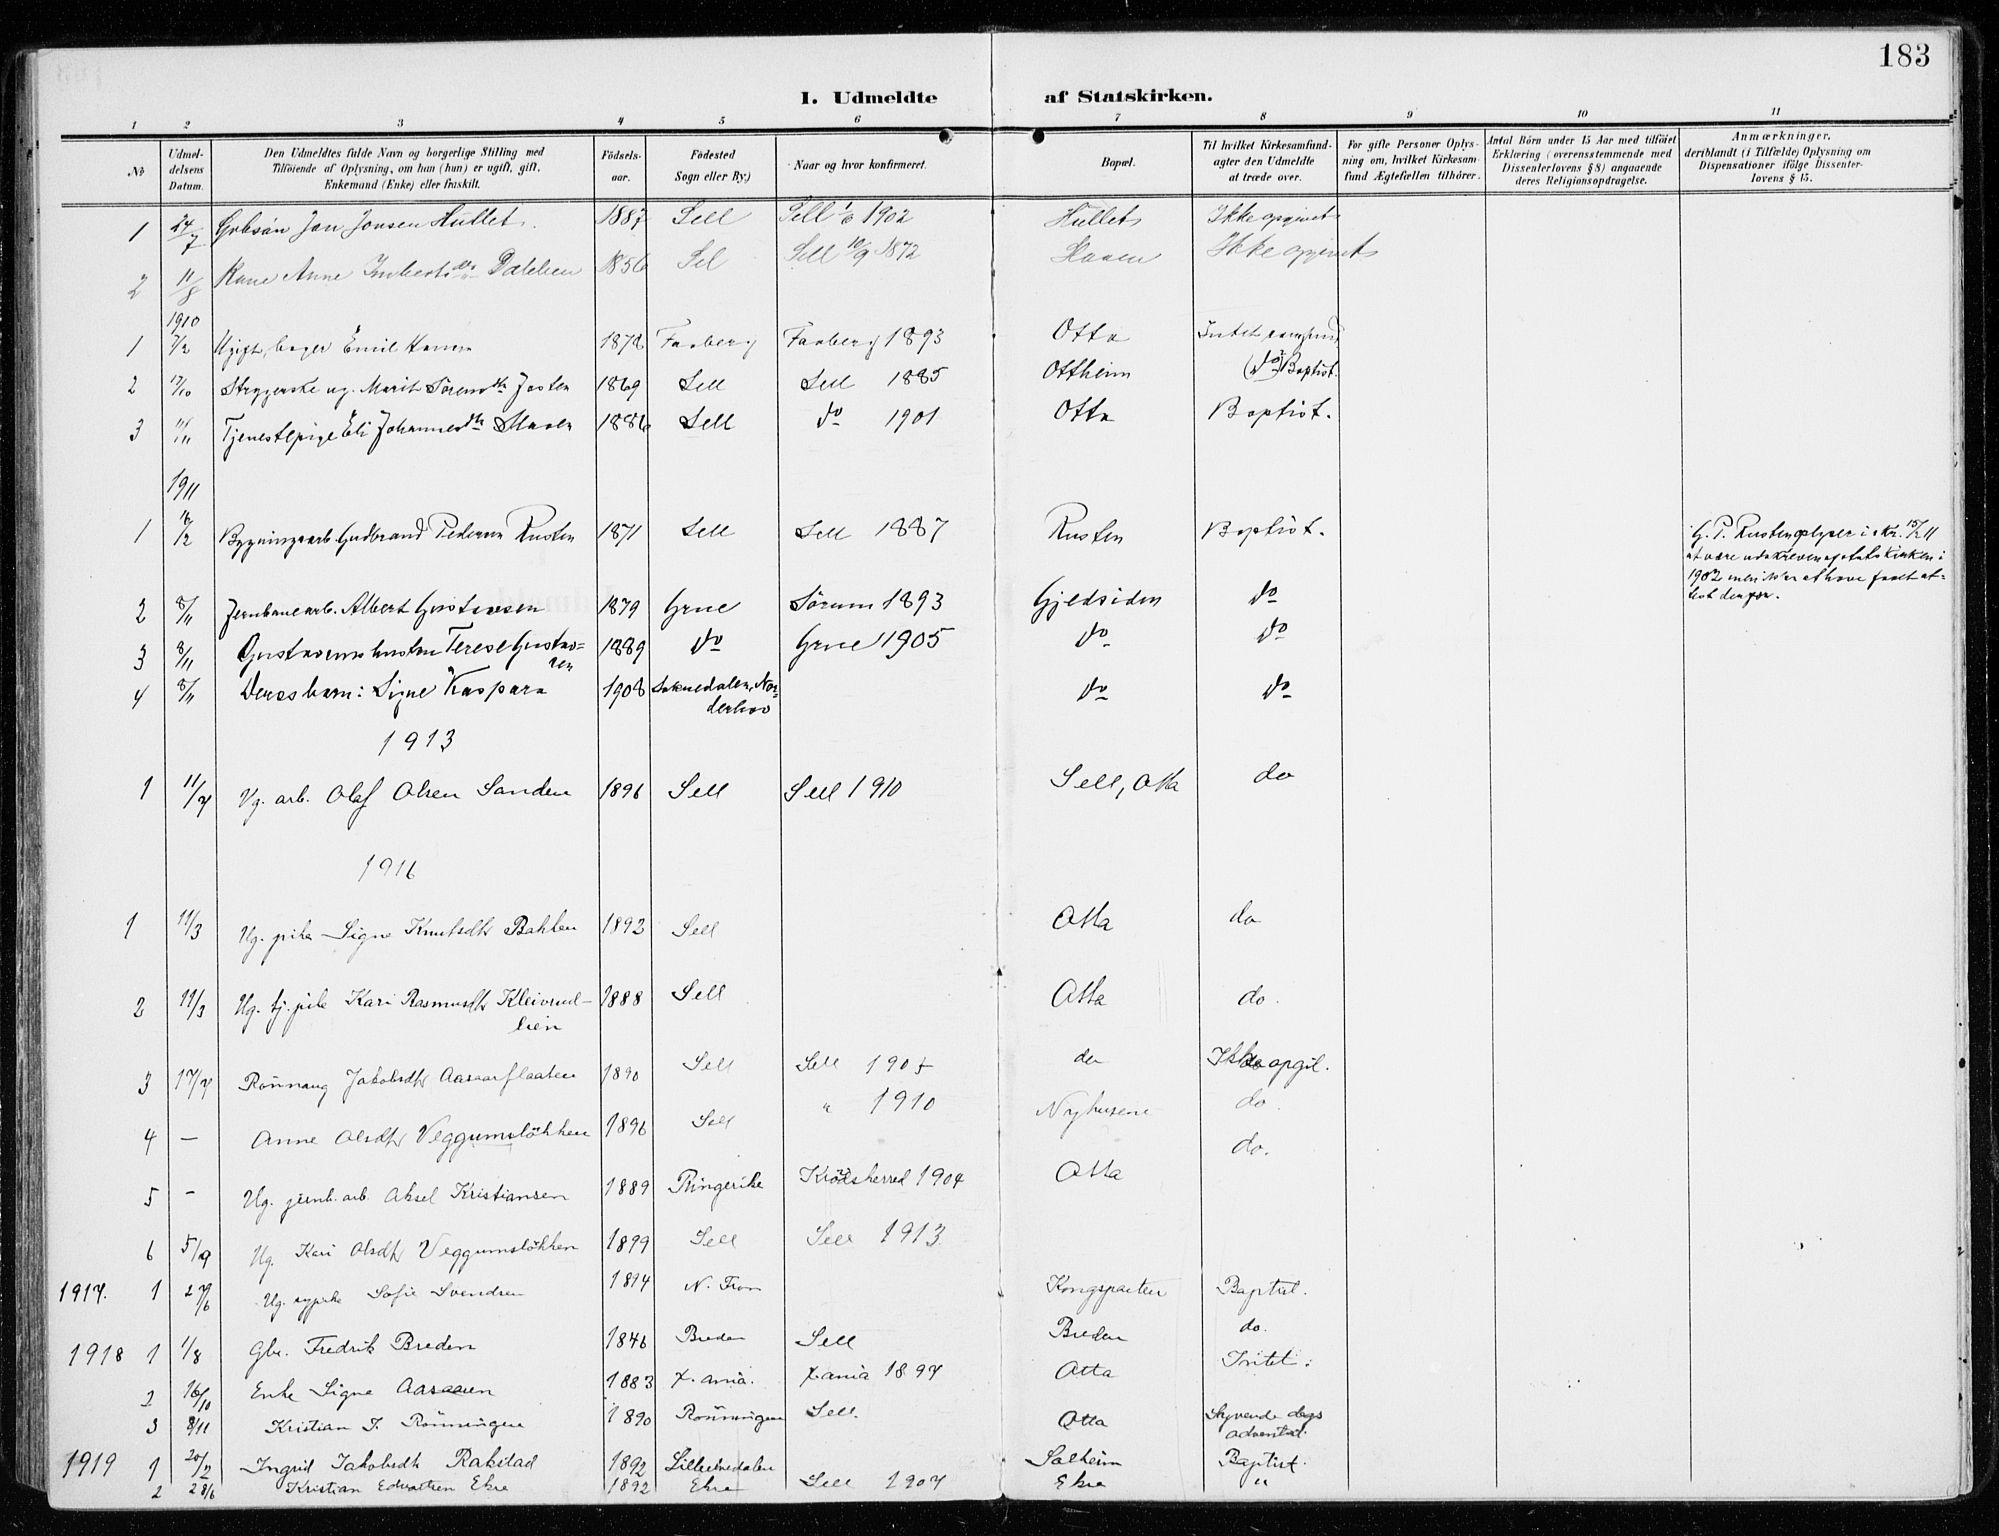 SAH, Sel prestekontor, Ministerialbok nr. 2, 1905-1919, s. 183